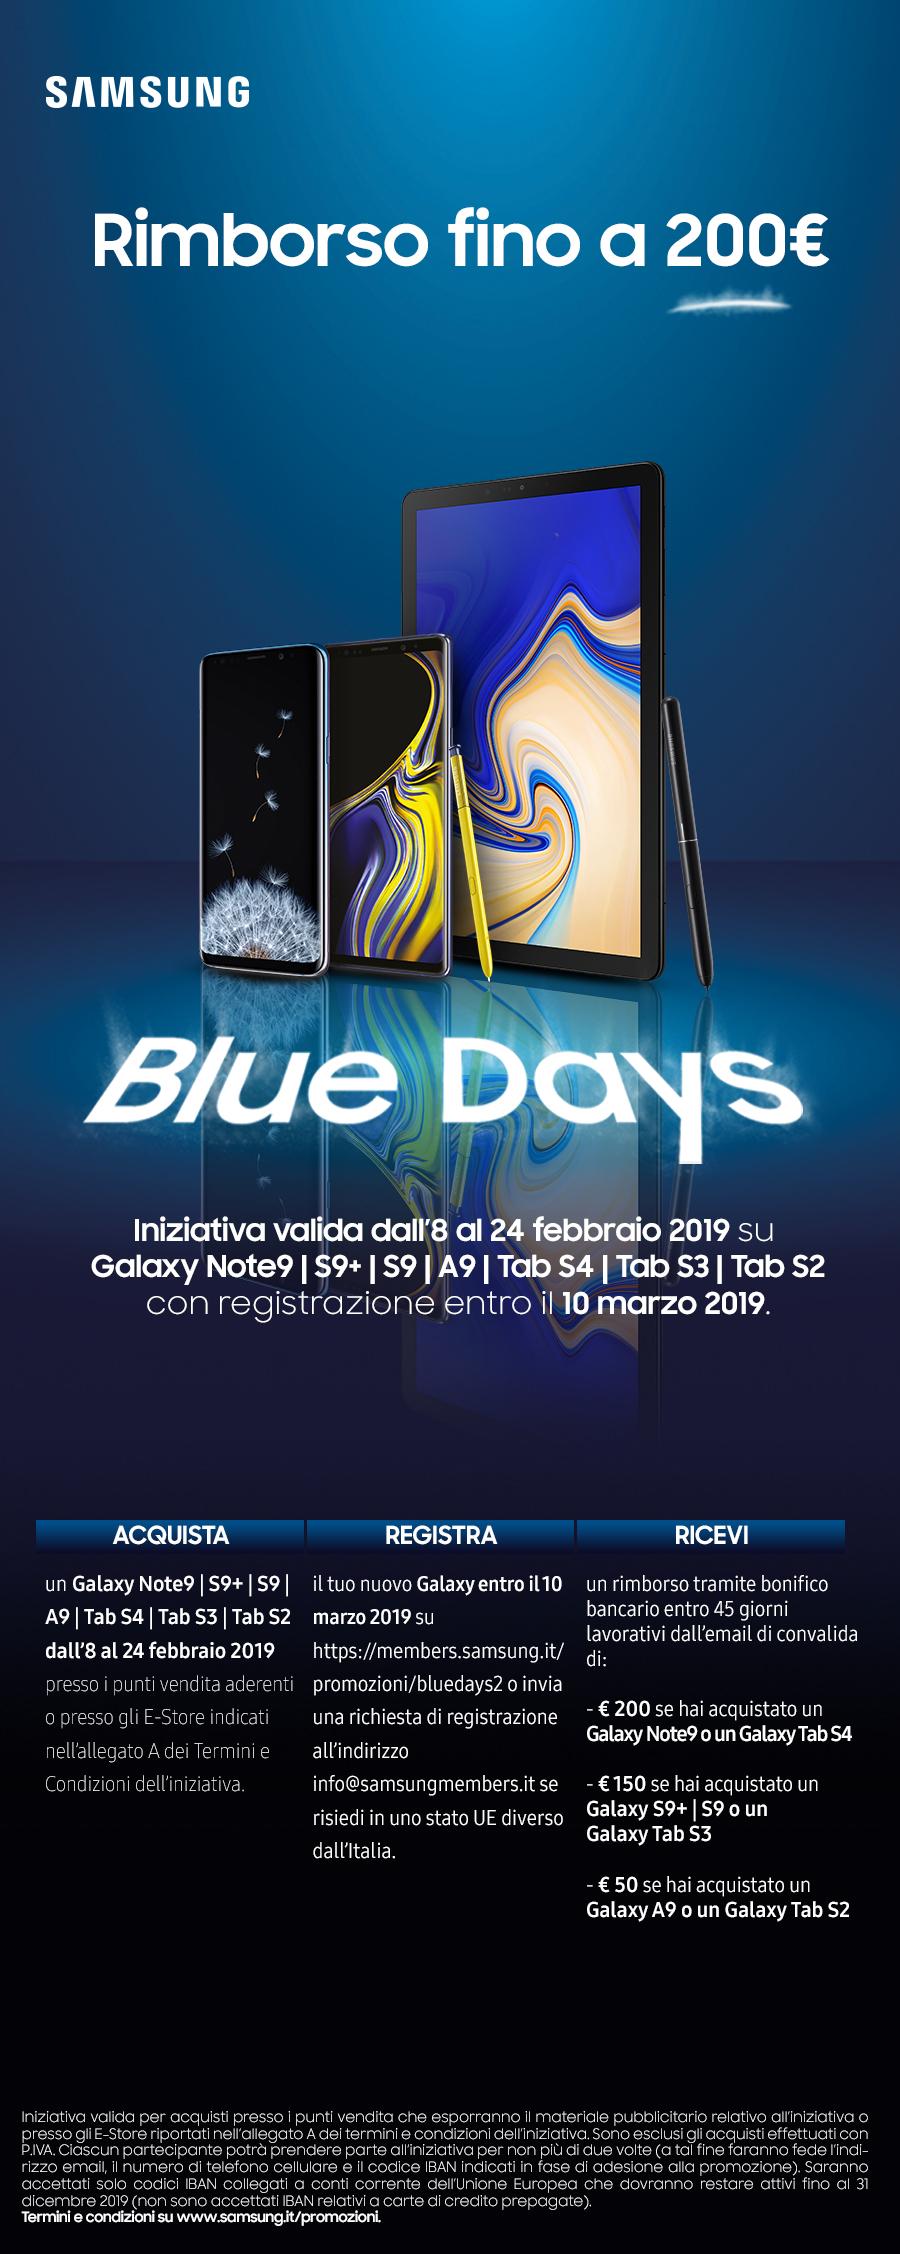 Samsung Blue Days: rimborso fino a € 200